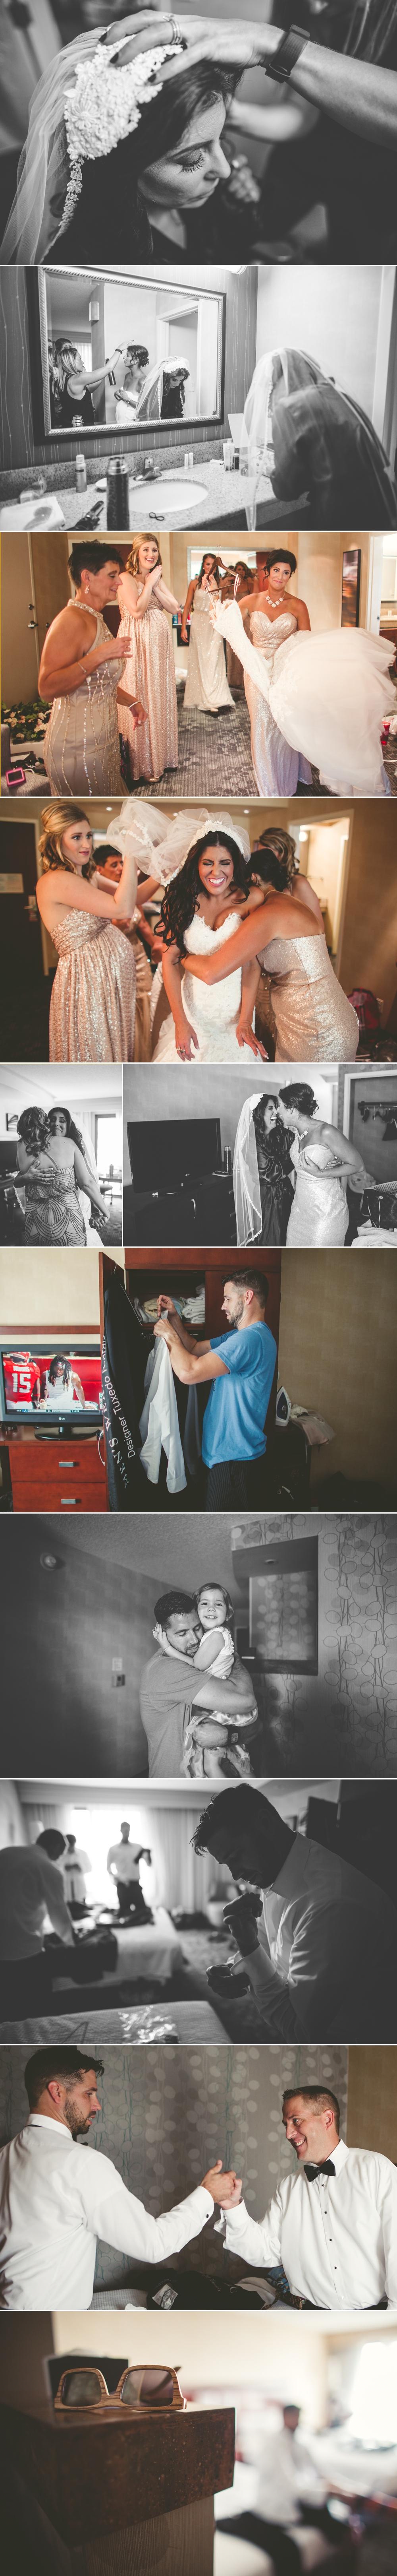 jason_domingues_photography_best_kansas_city_wedding_photographer_louisburg_ks_tomahawk_hills_1.jpg